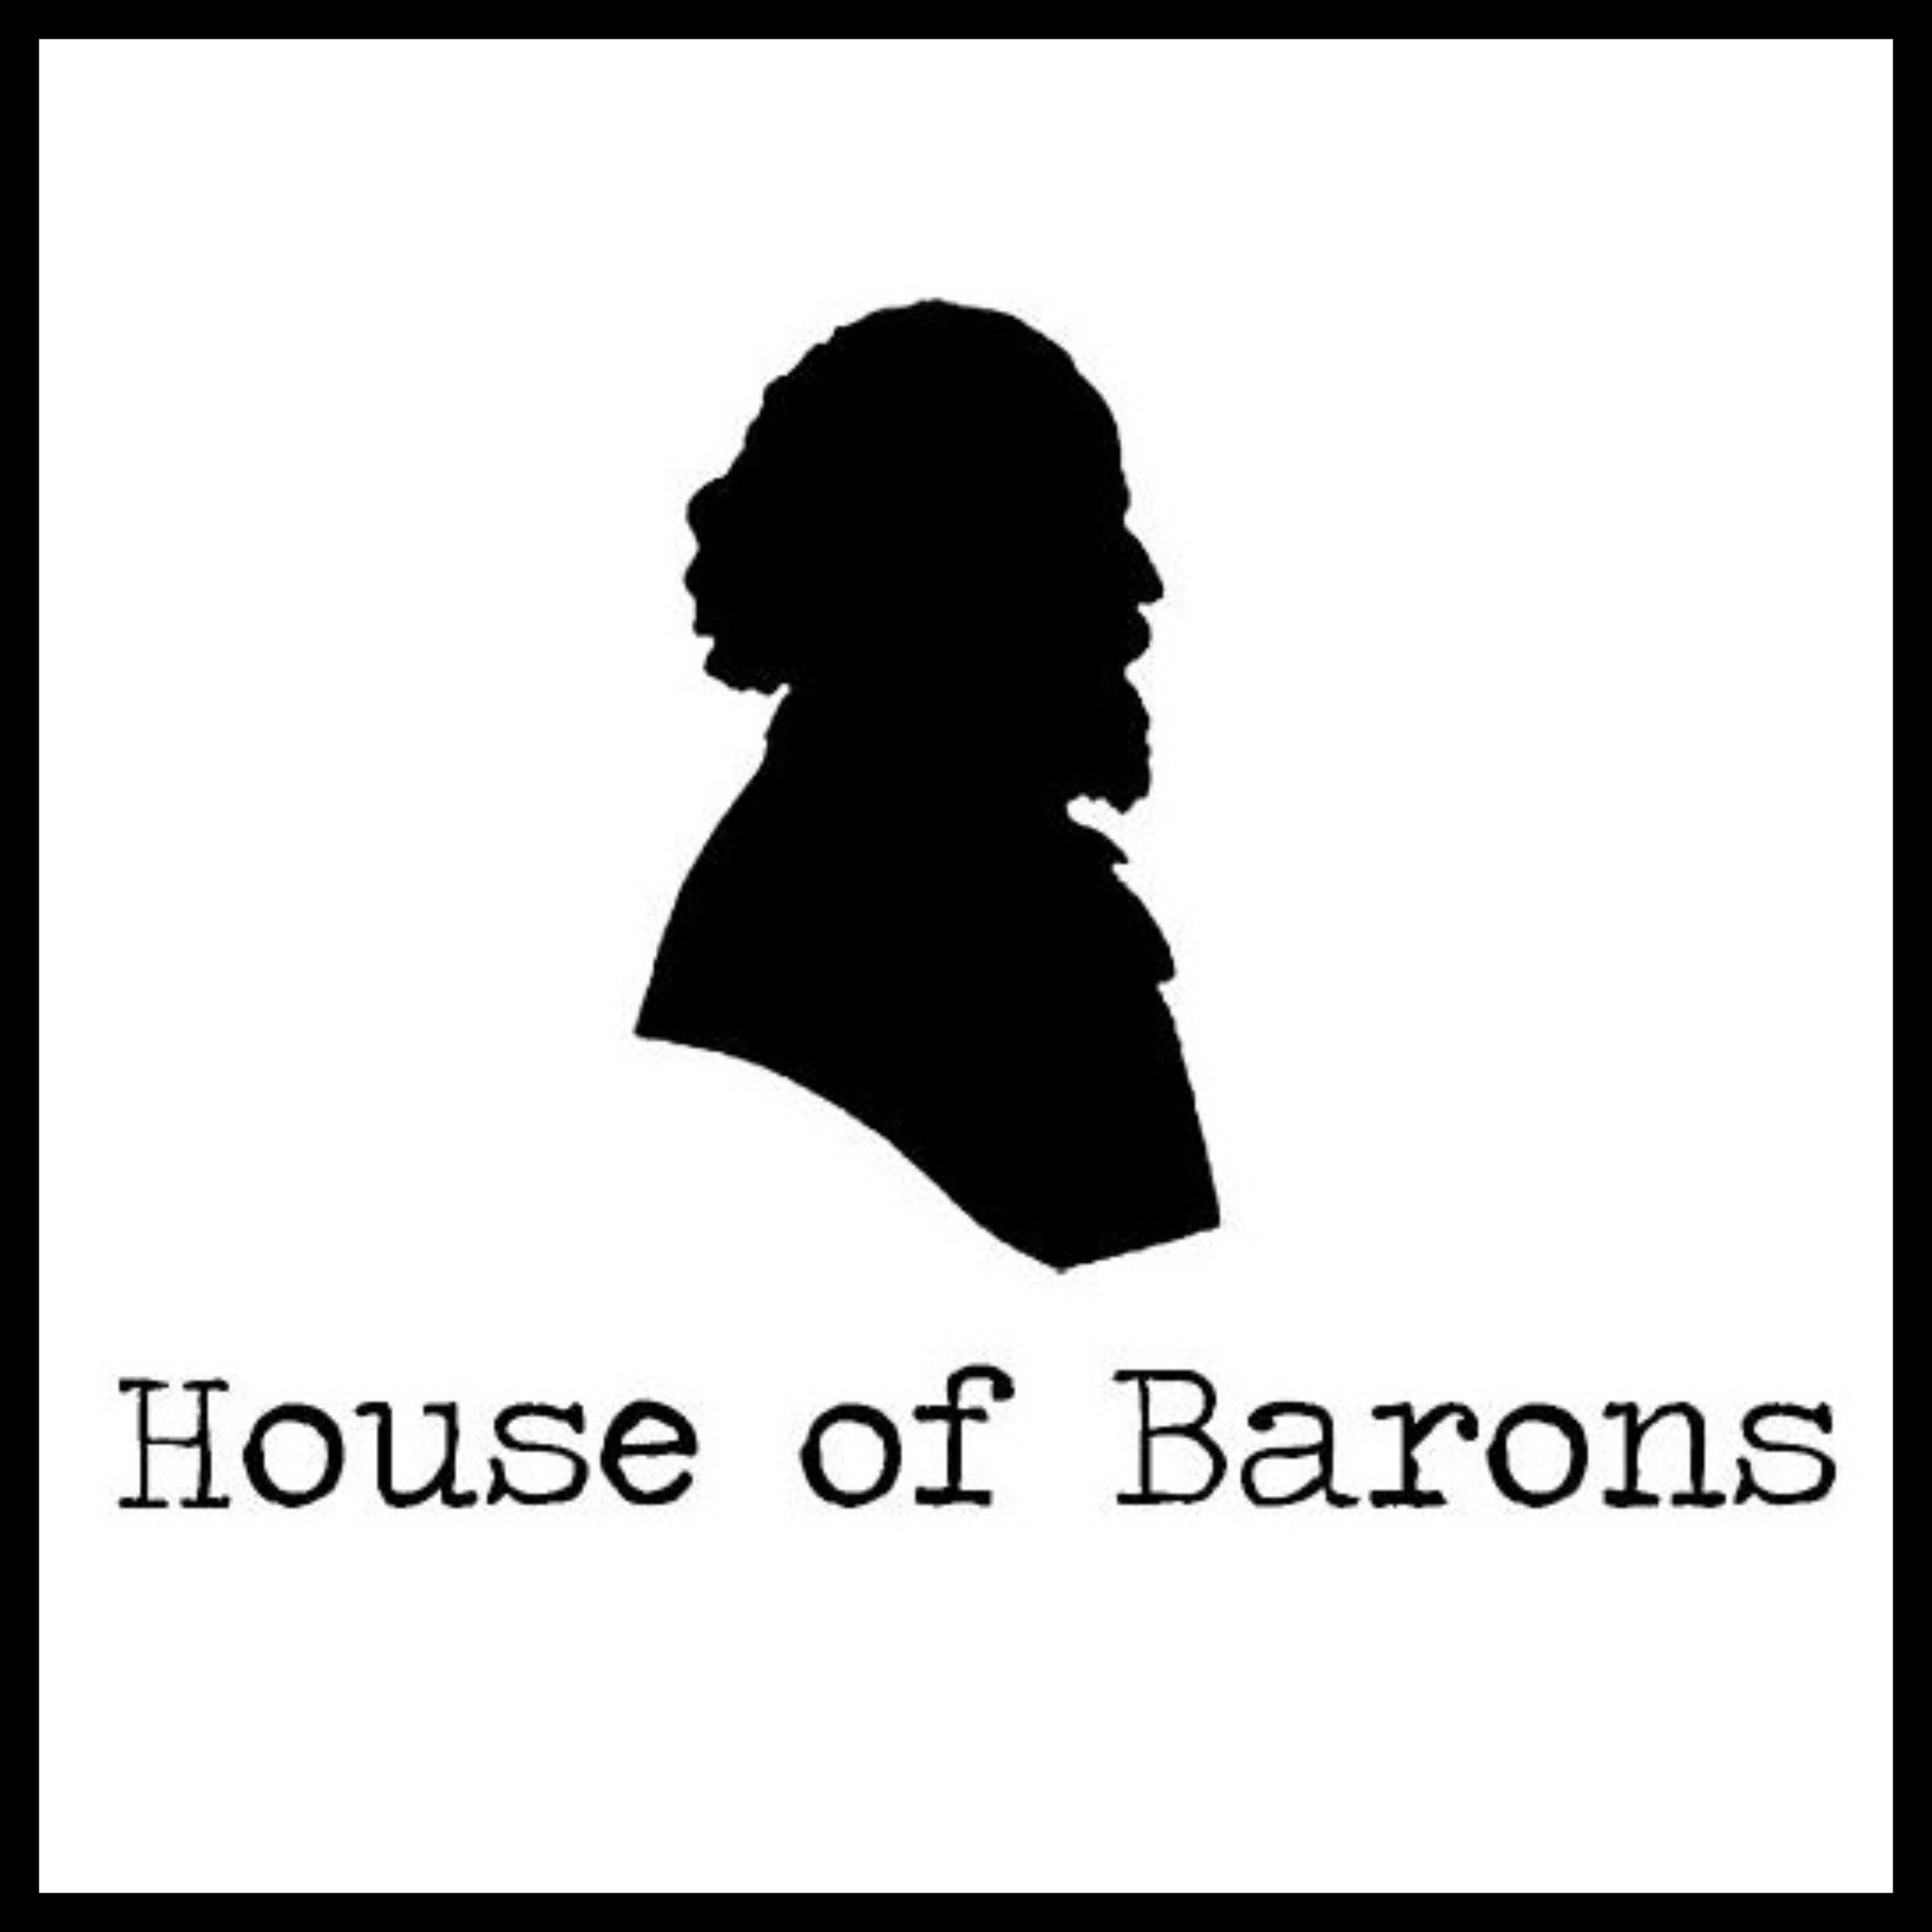 HouseofBaronsSQ.jpg